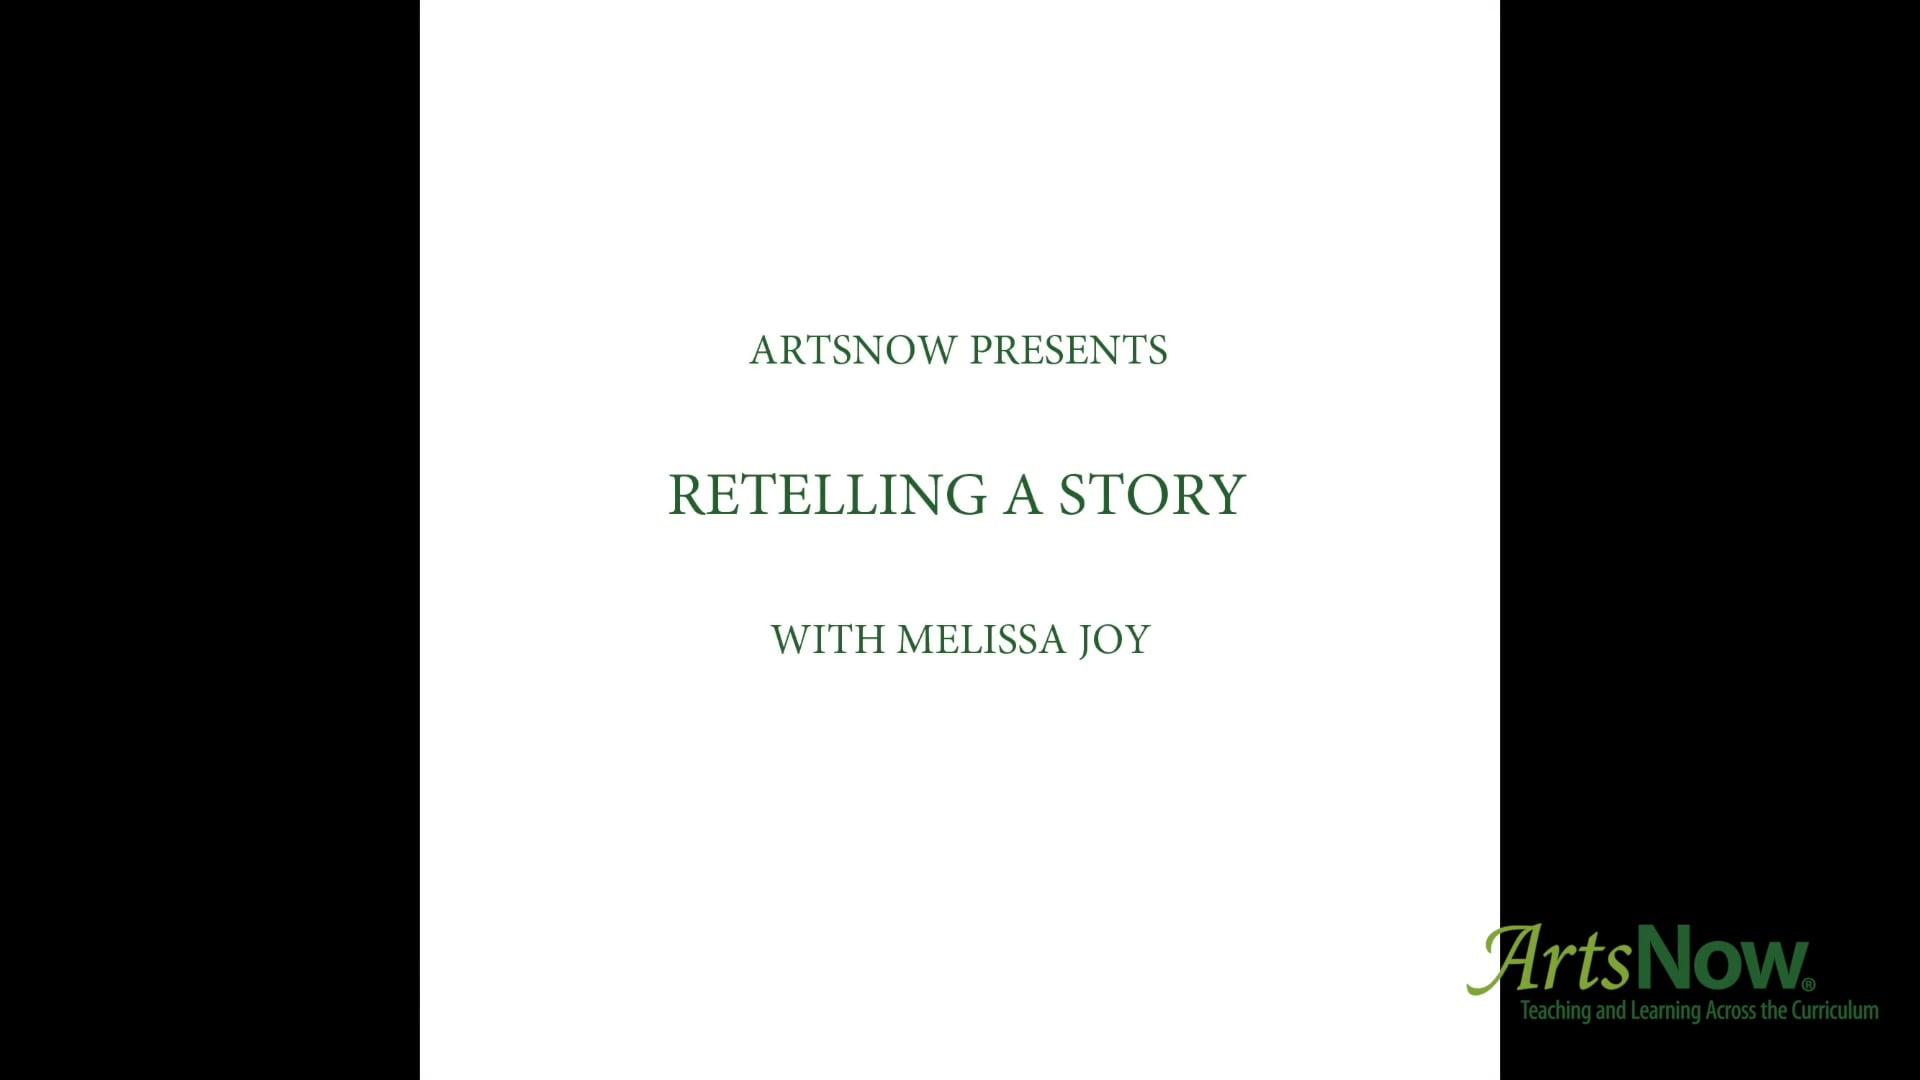 New Digital Ideas: Retell a Story